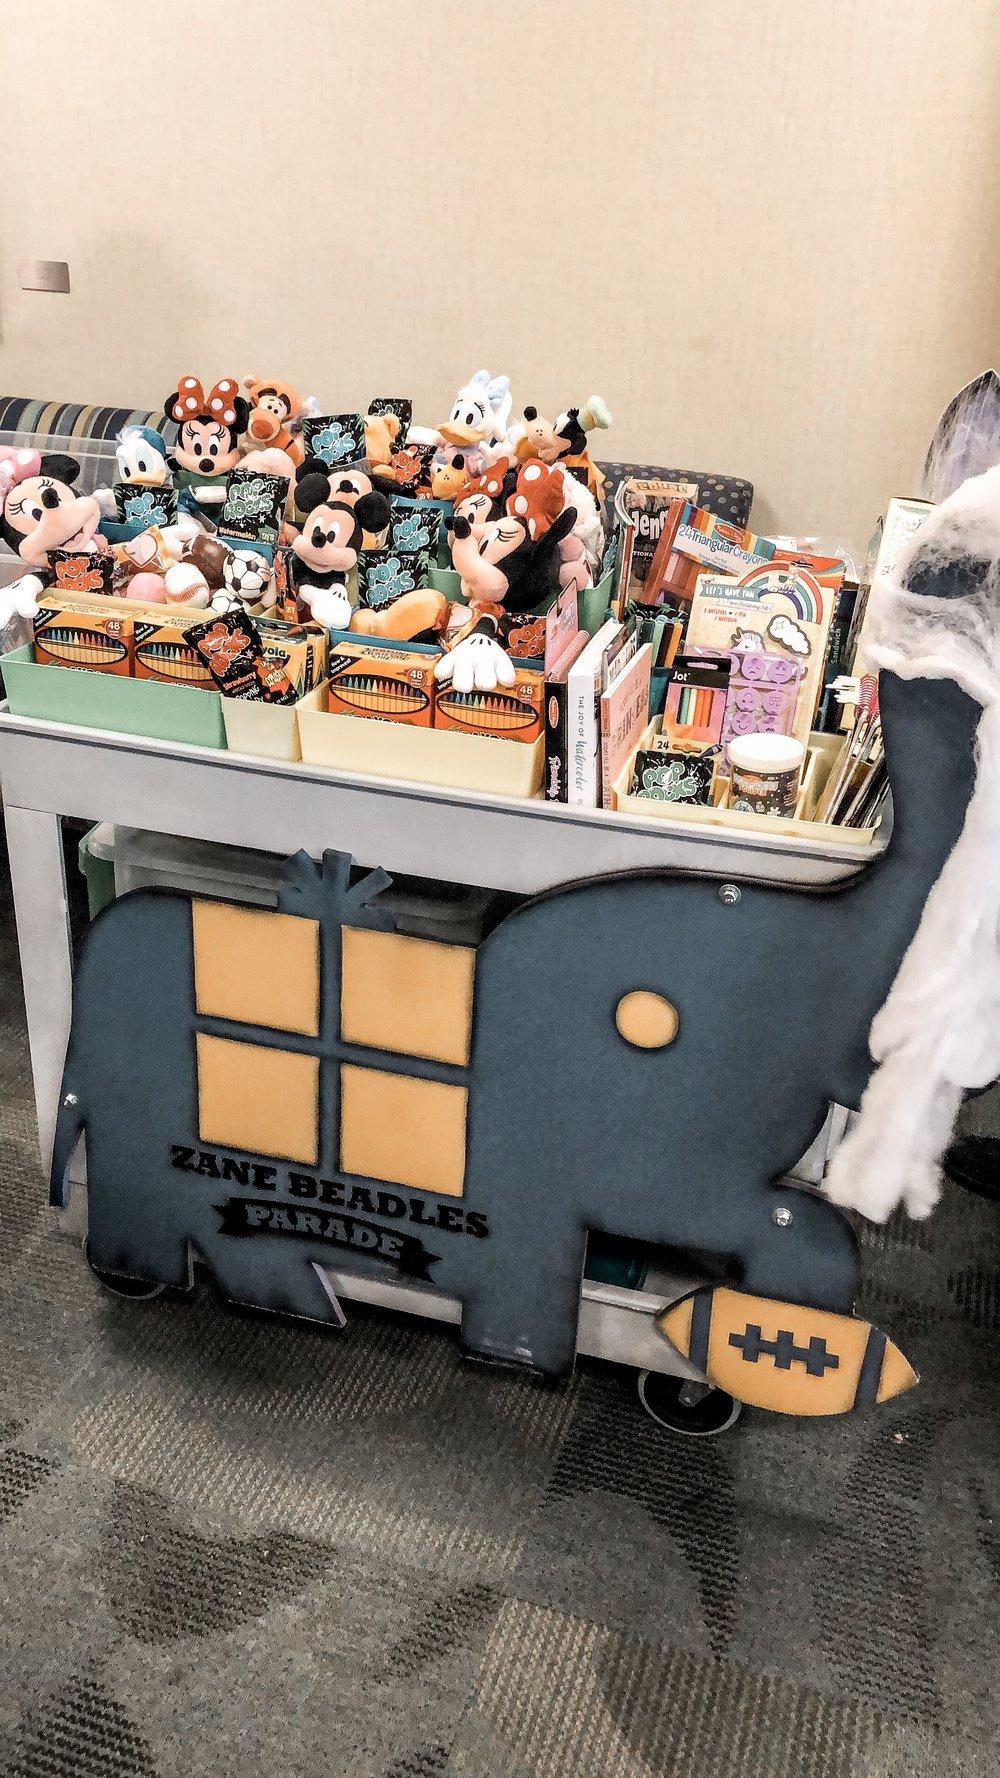 Zane's Parade cart at Rocky Mountain Children's Hospital